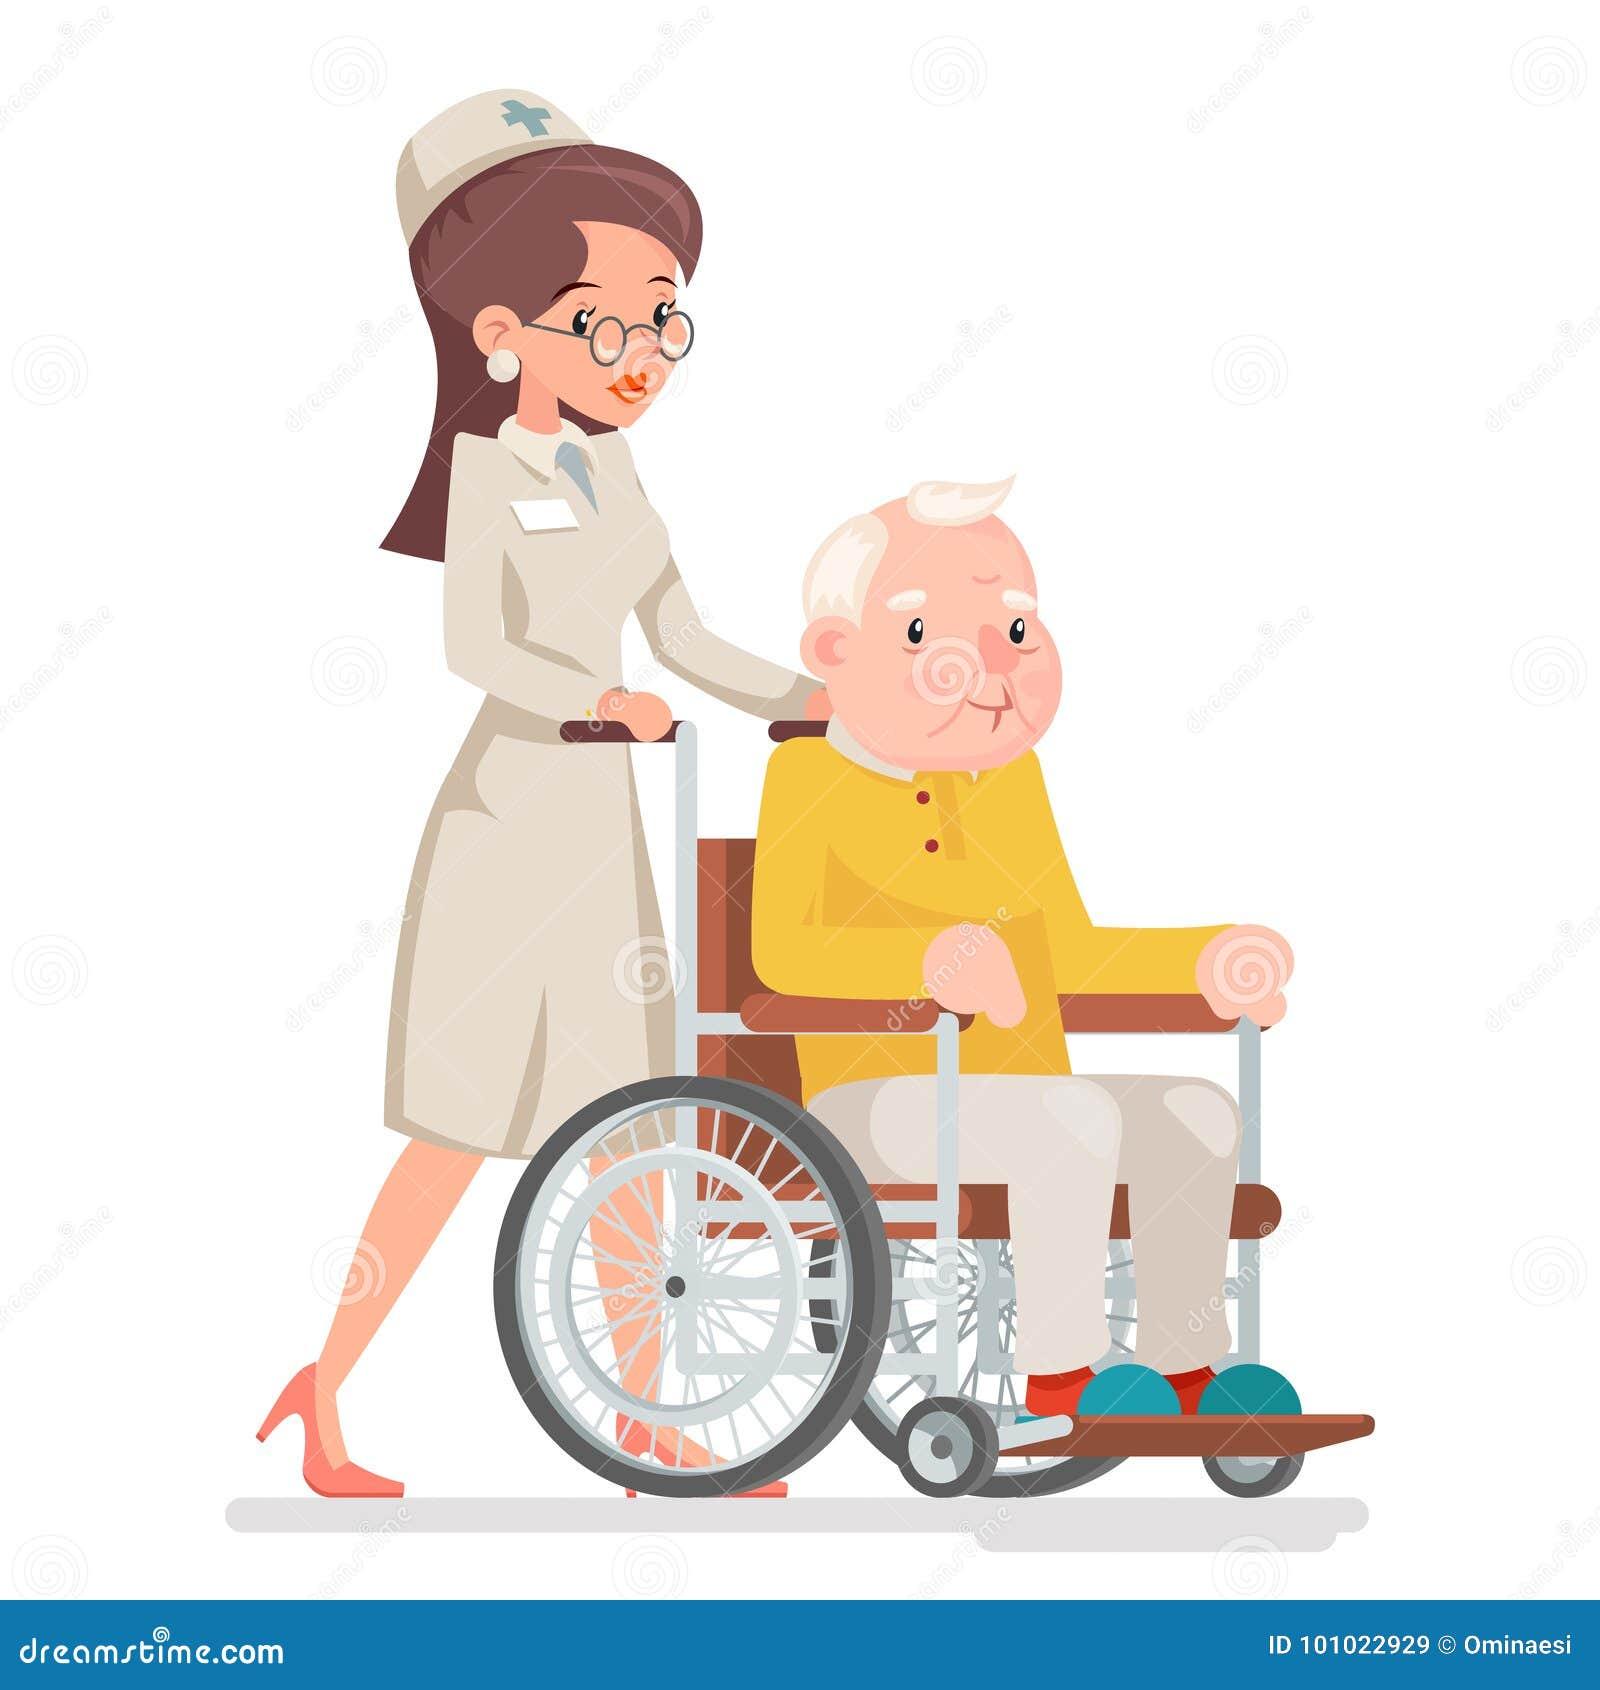 Netter mitfühlender Rollstuhl-alter Mann-Charakter-Sit Adult Icon Cartoon Design-Vektor Doktor-Attendant Nurse Elderly